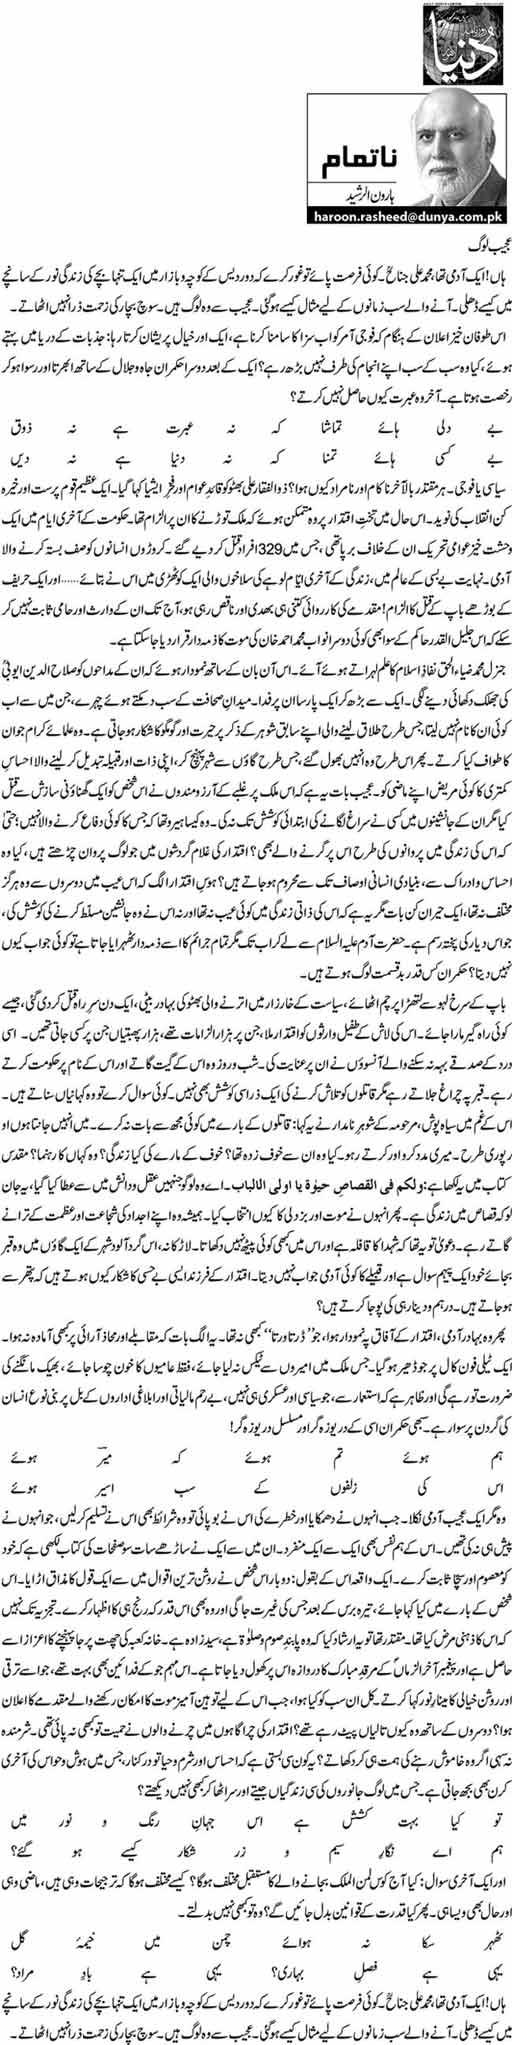 Ajeeb Log - Haroon-ur-Rasheed